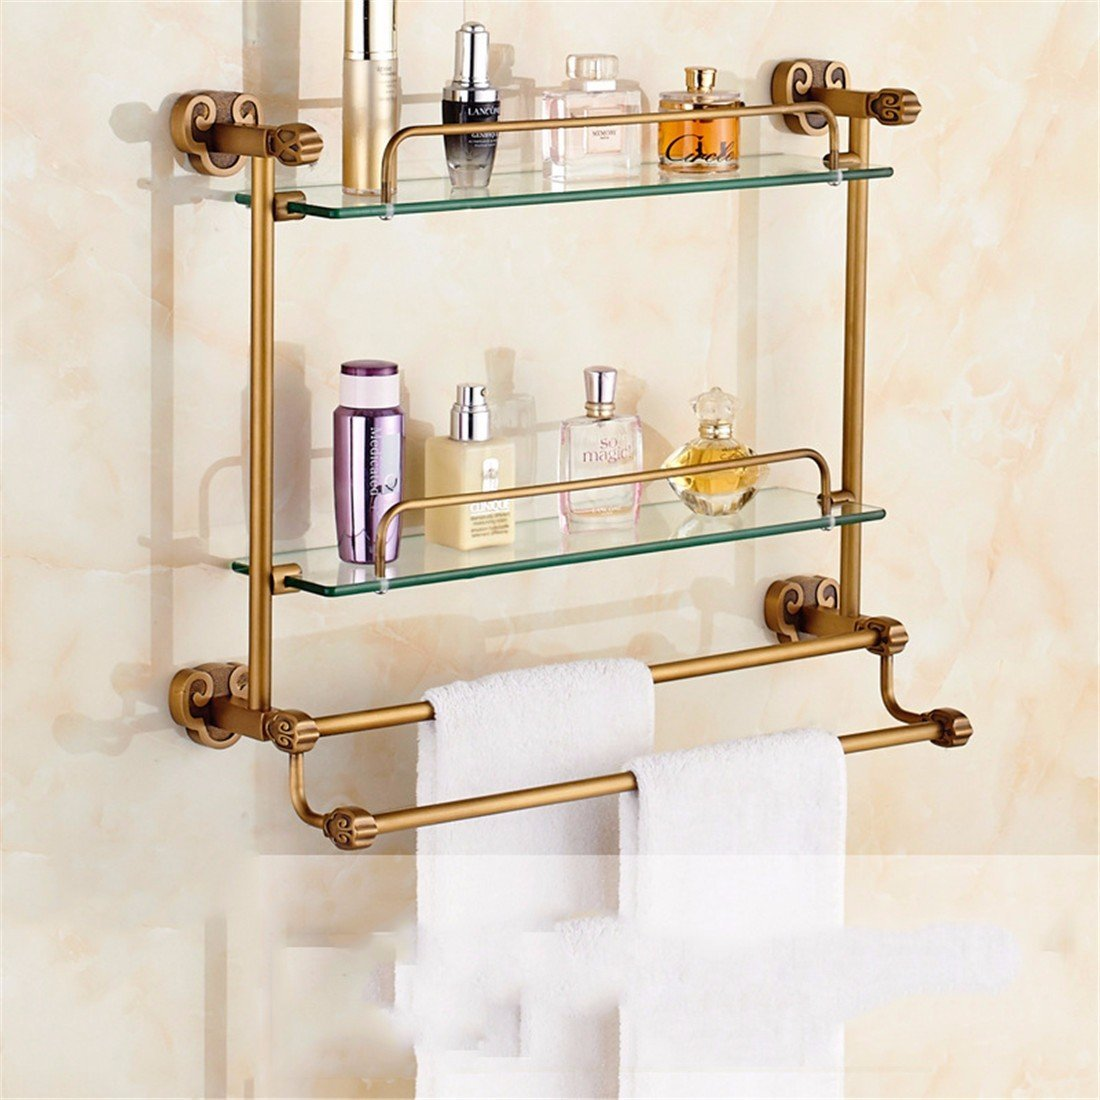 LAONA All copper antique European style horn base, bathroom fittings, rack, towel rack, toilet paper rack,Shelf 2 A 58cm